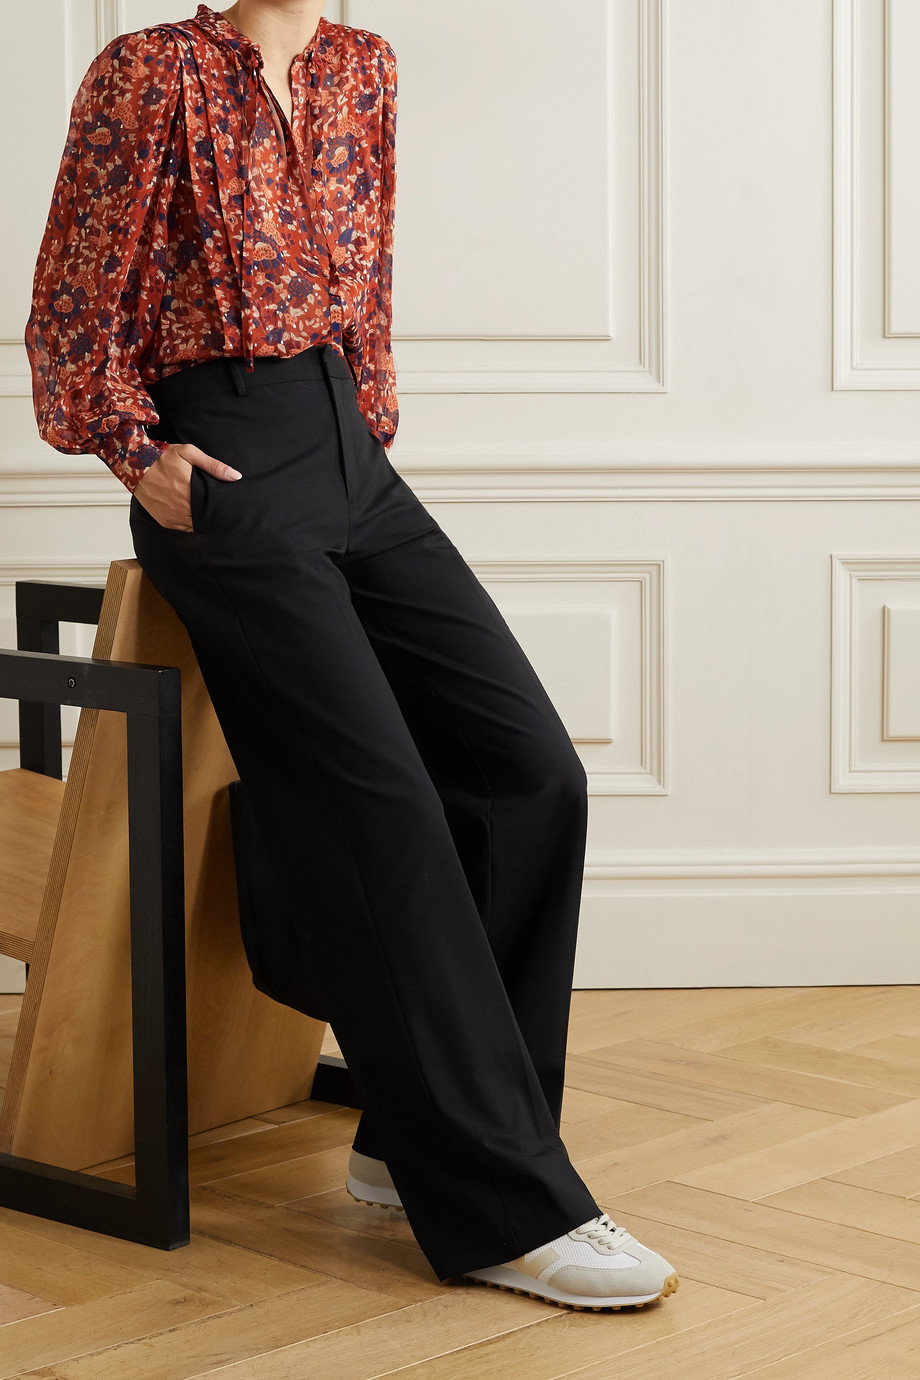 Ulla Johnson Edith floral-print fil coupé silk and Lurex-blend blouse